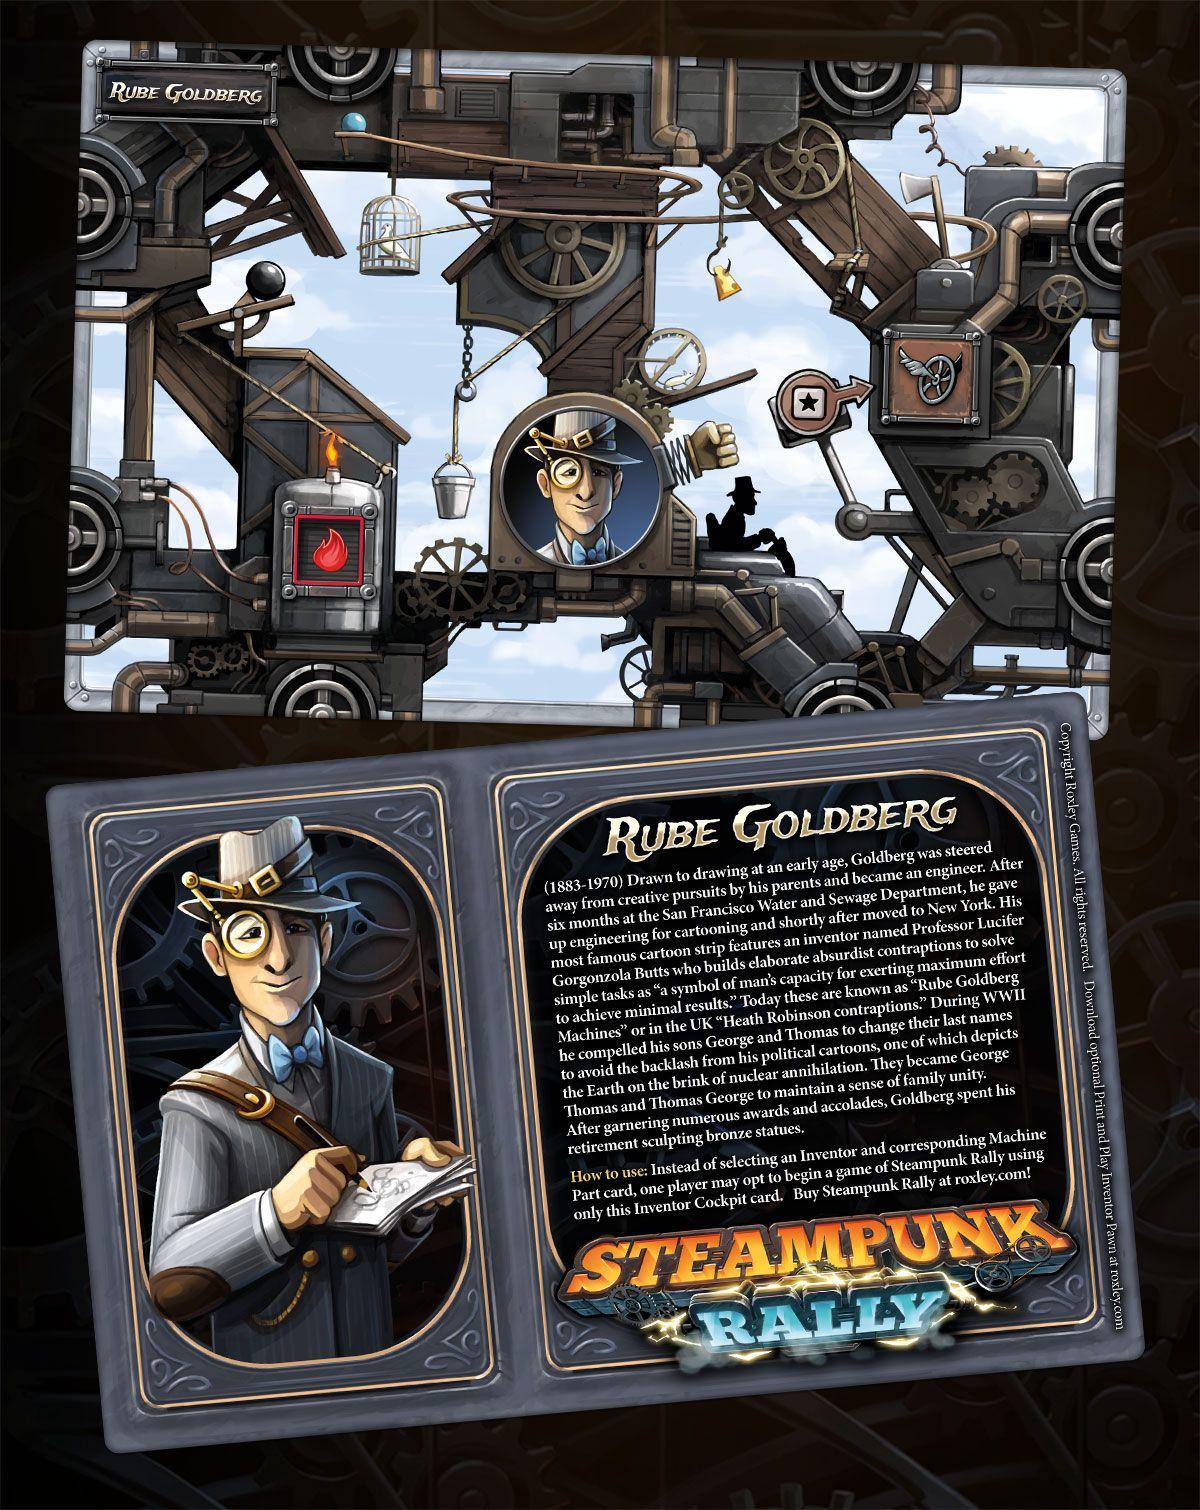 Steampunk Rally: Rube Goldberg